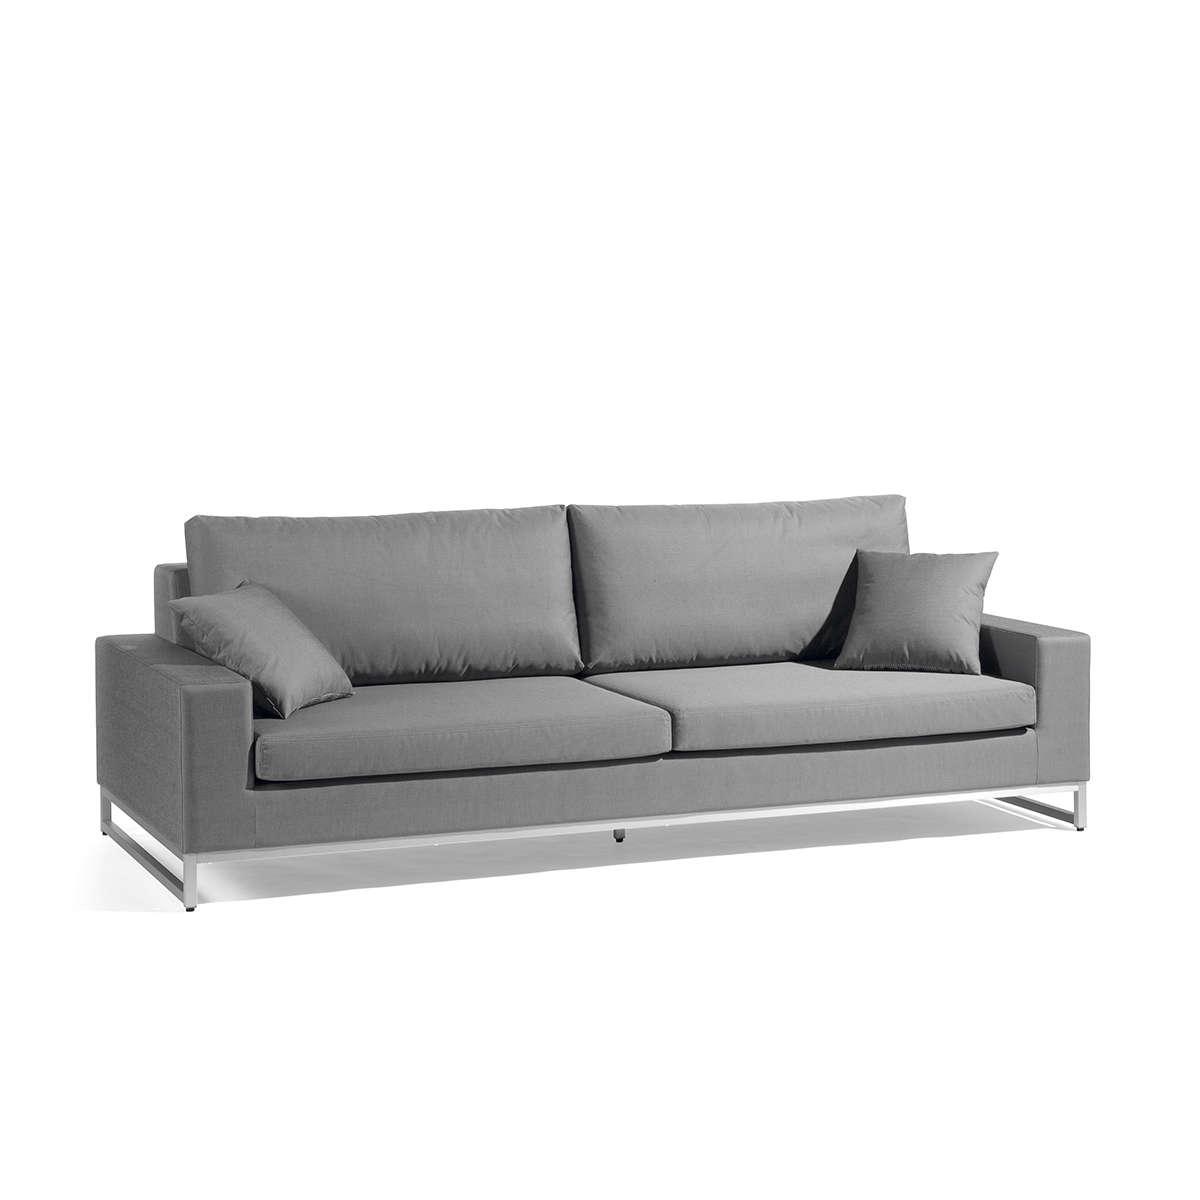 Manutti Zendo Sofa Hr 4